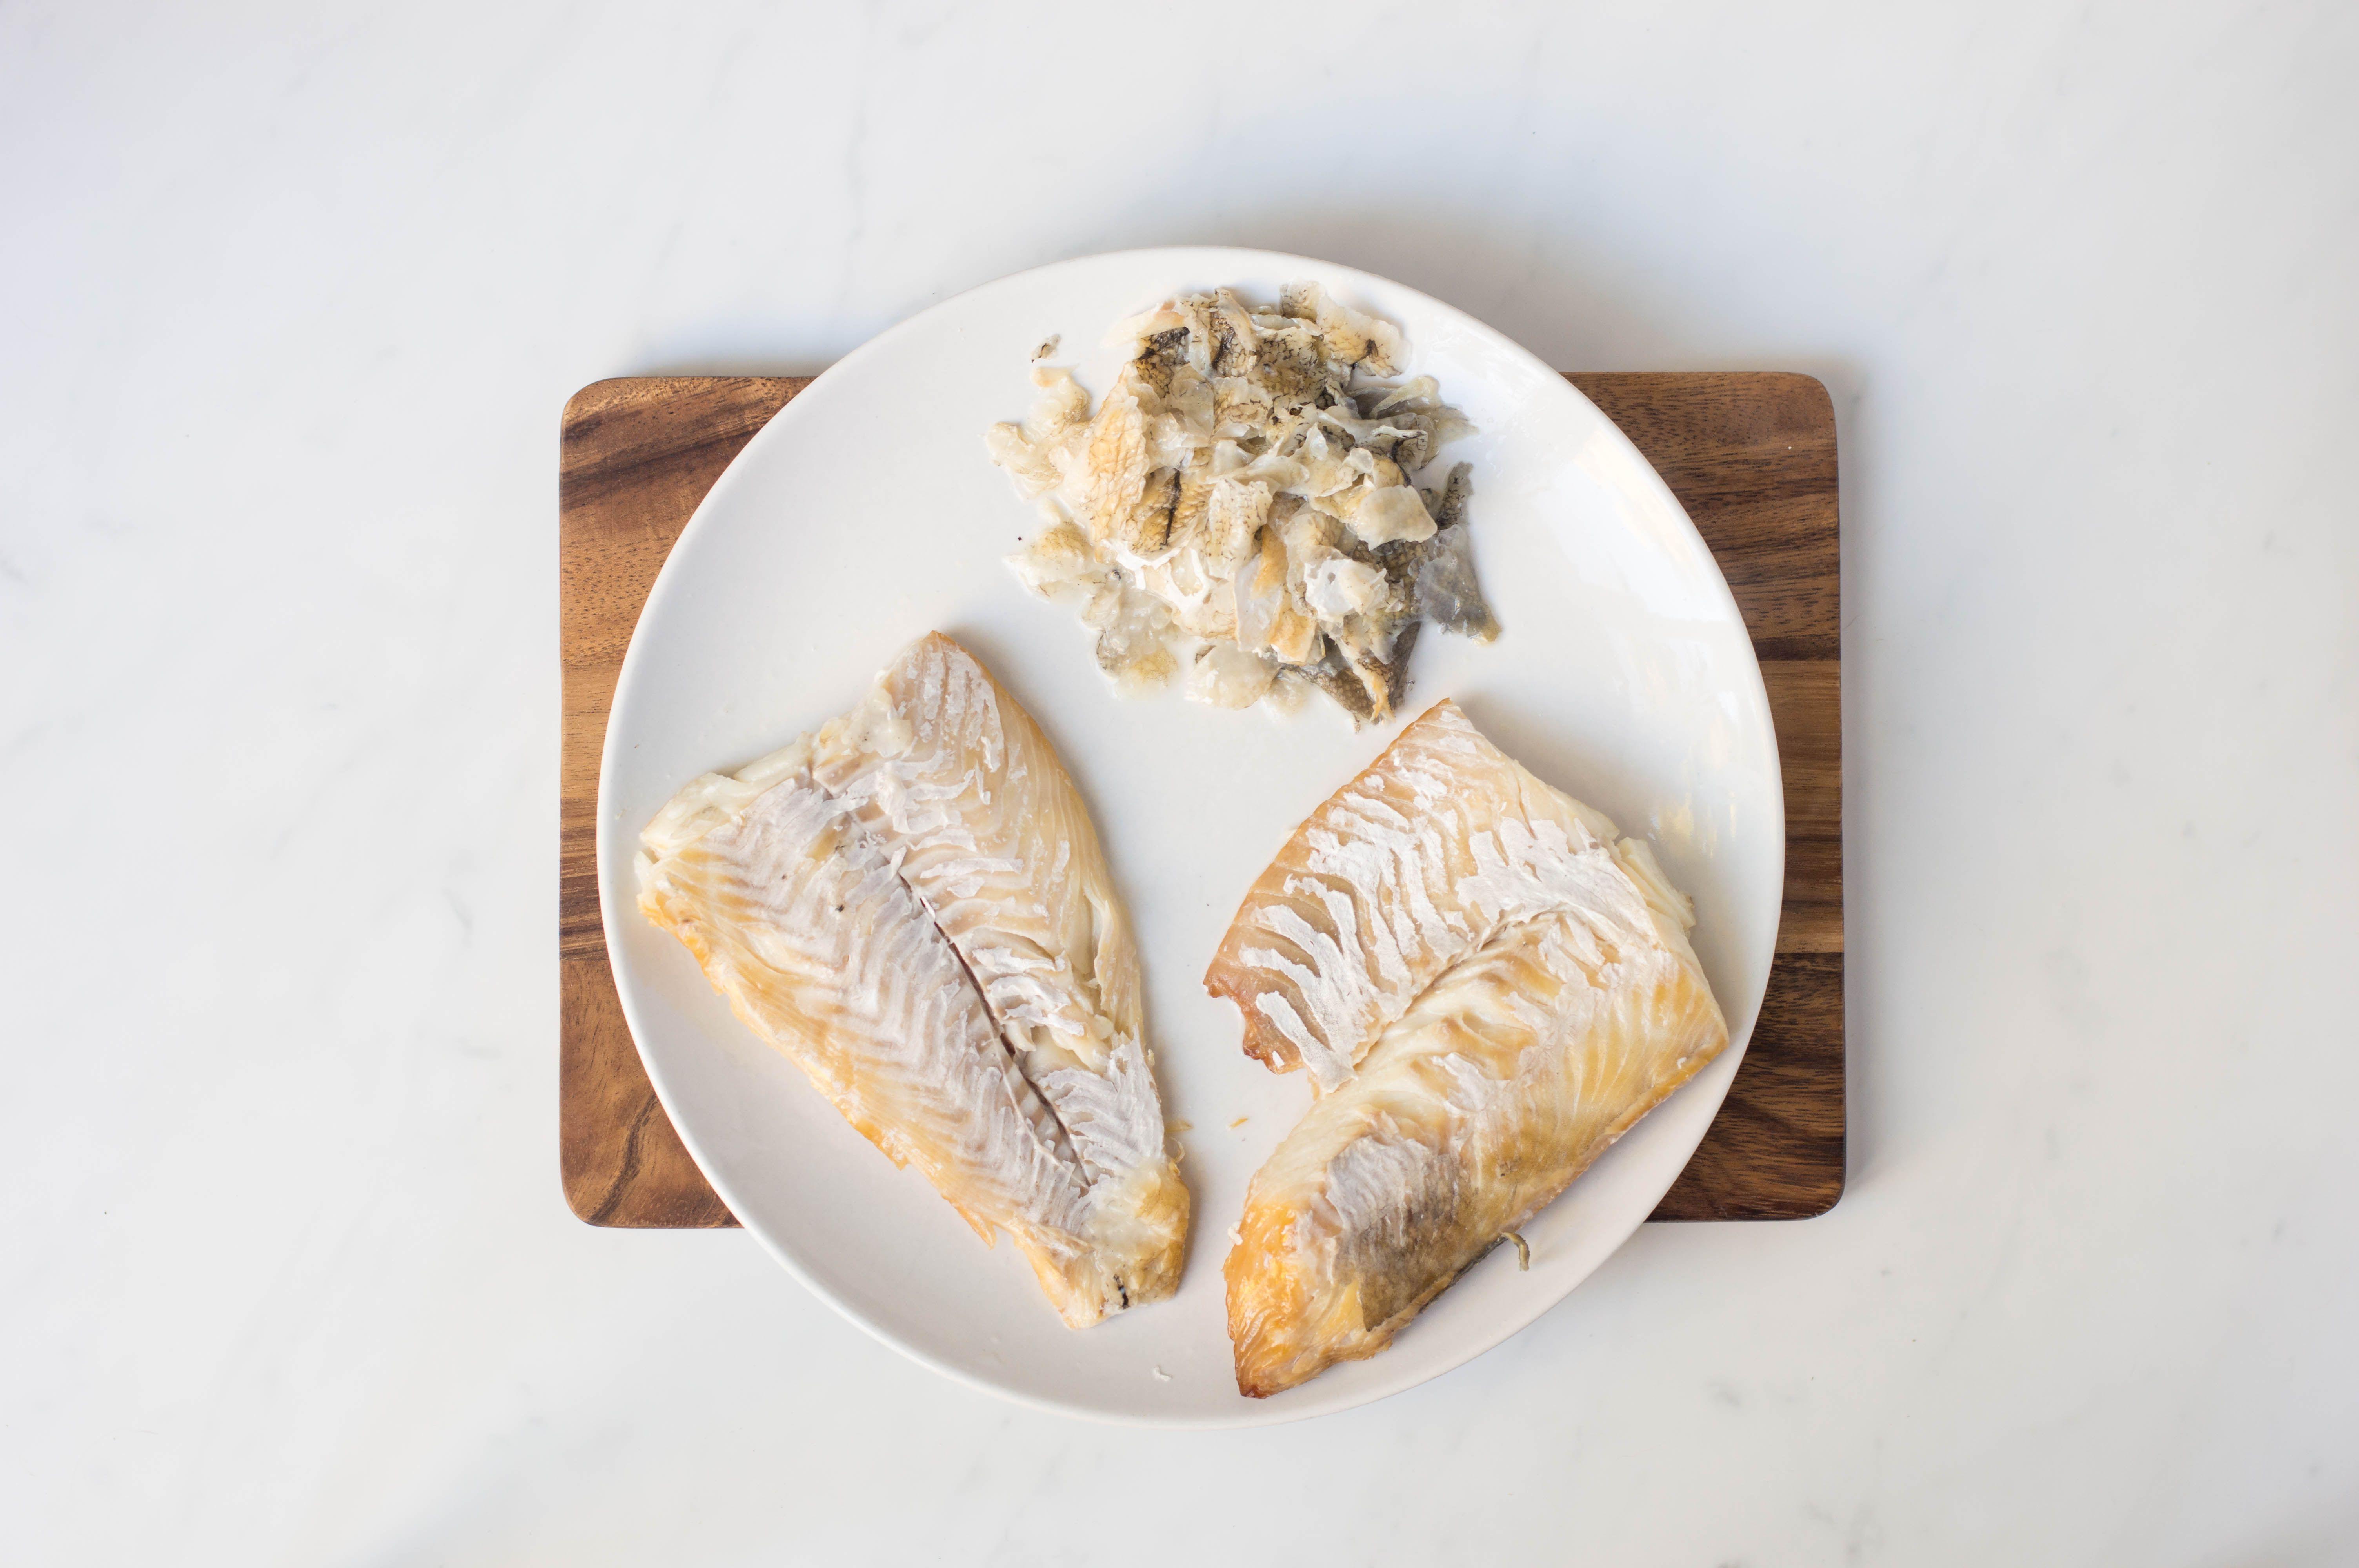 Flaking fish for kedgeree